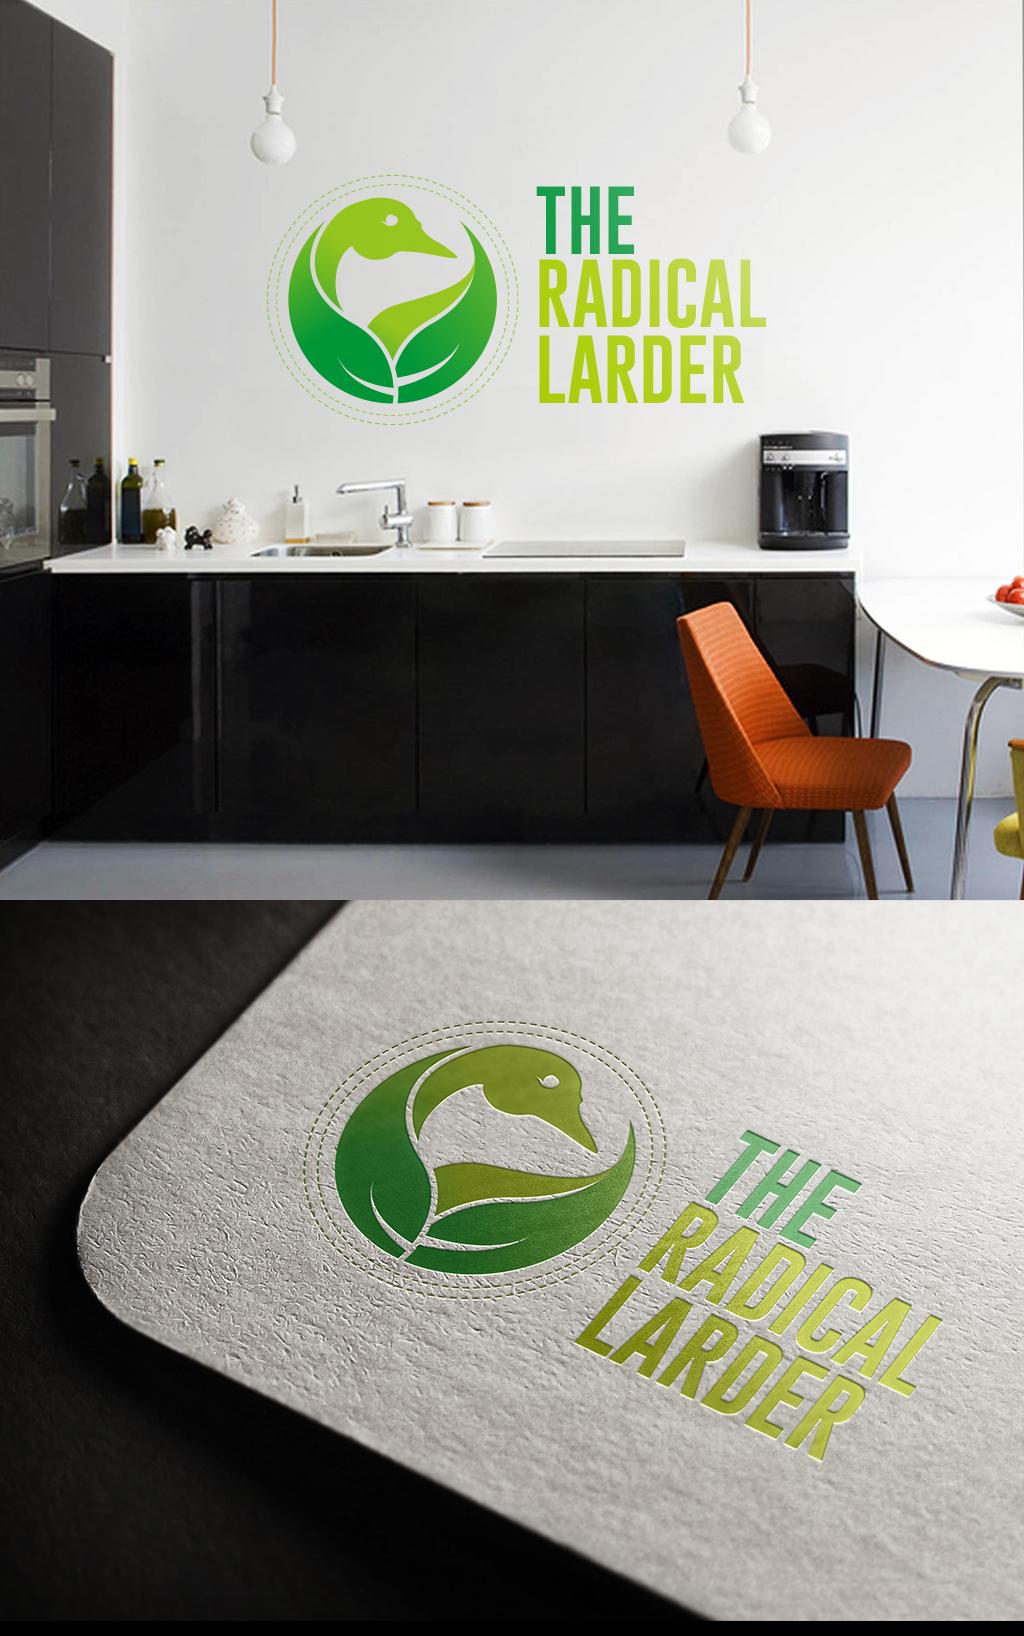 Logo Design by Top Elite - Entry No. 31 in the Logo Design Contest Captivating Logo Design for The Radical Larder.